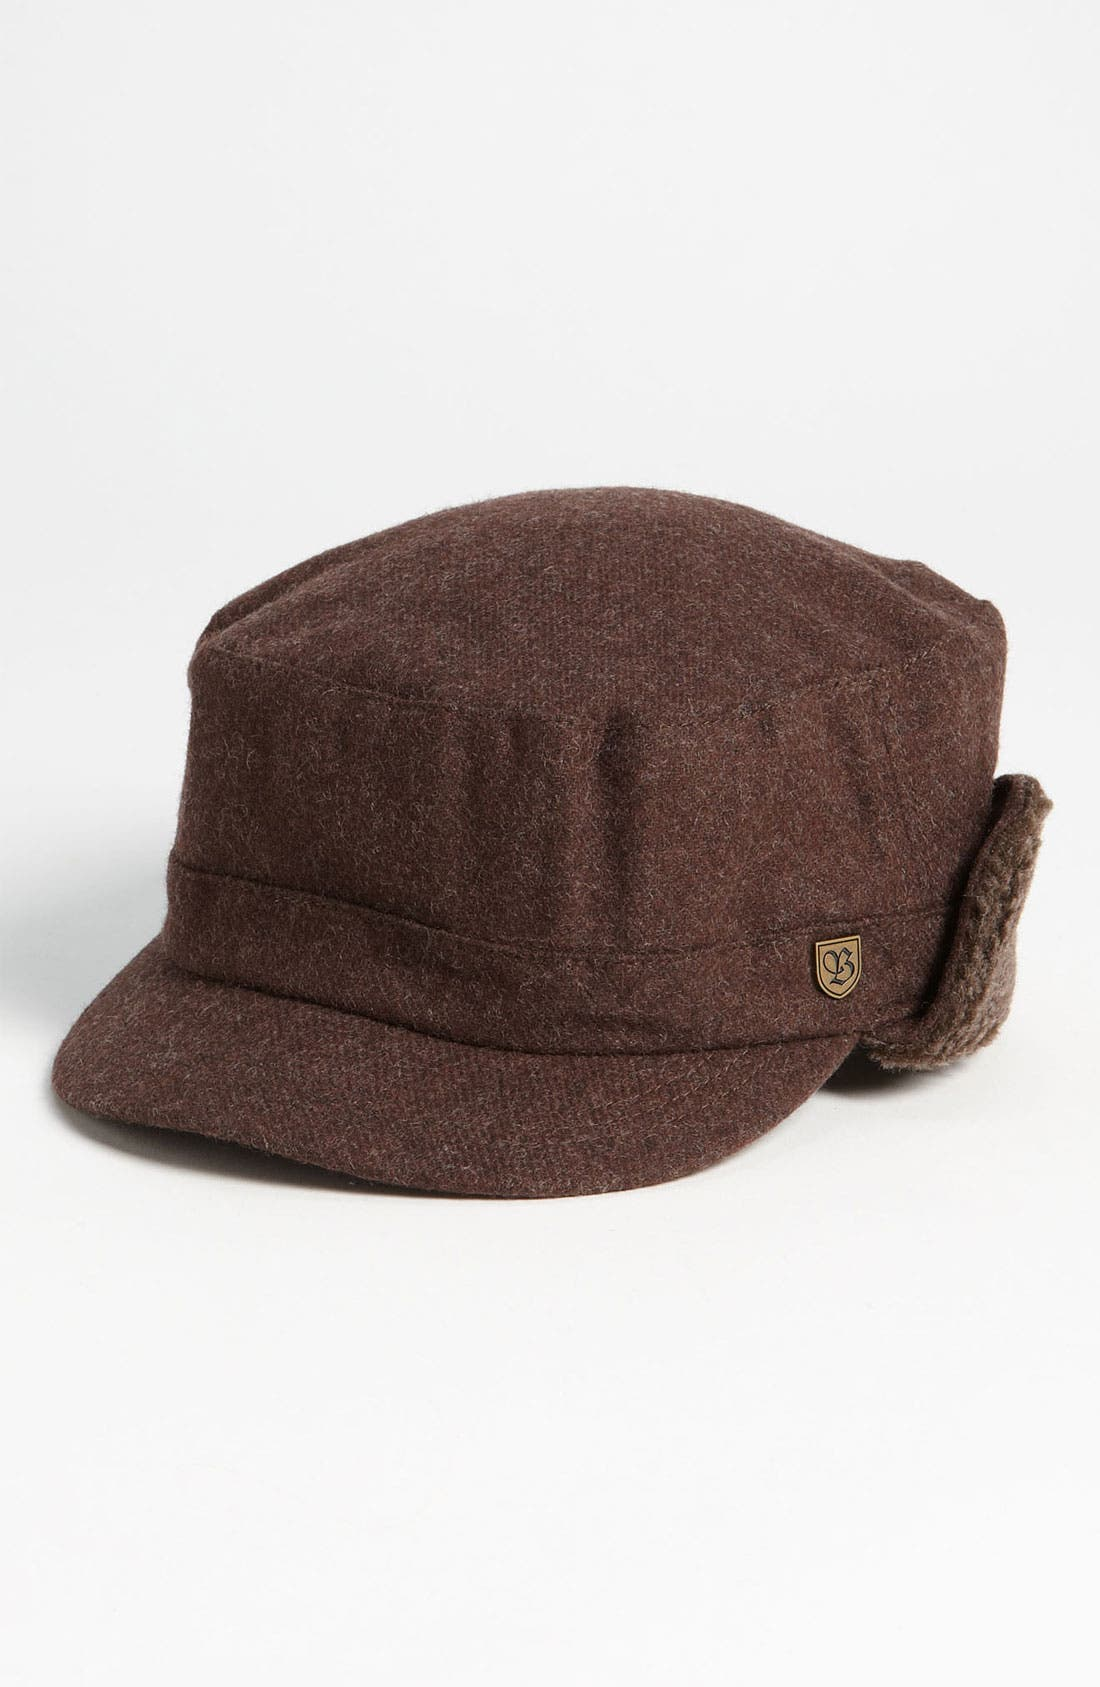 Main Image - Brixton 'Lodge' Military Cap